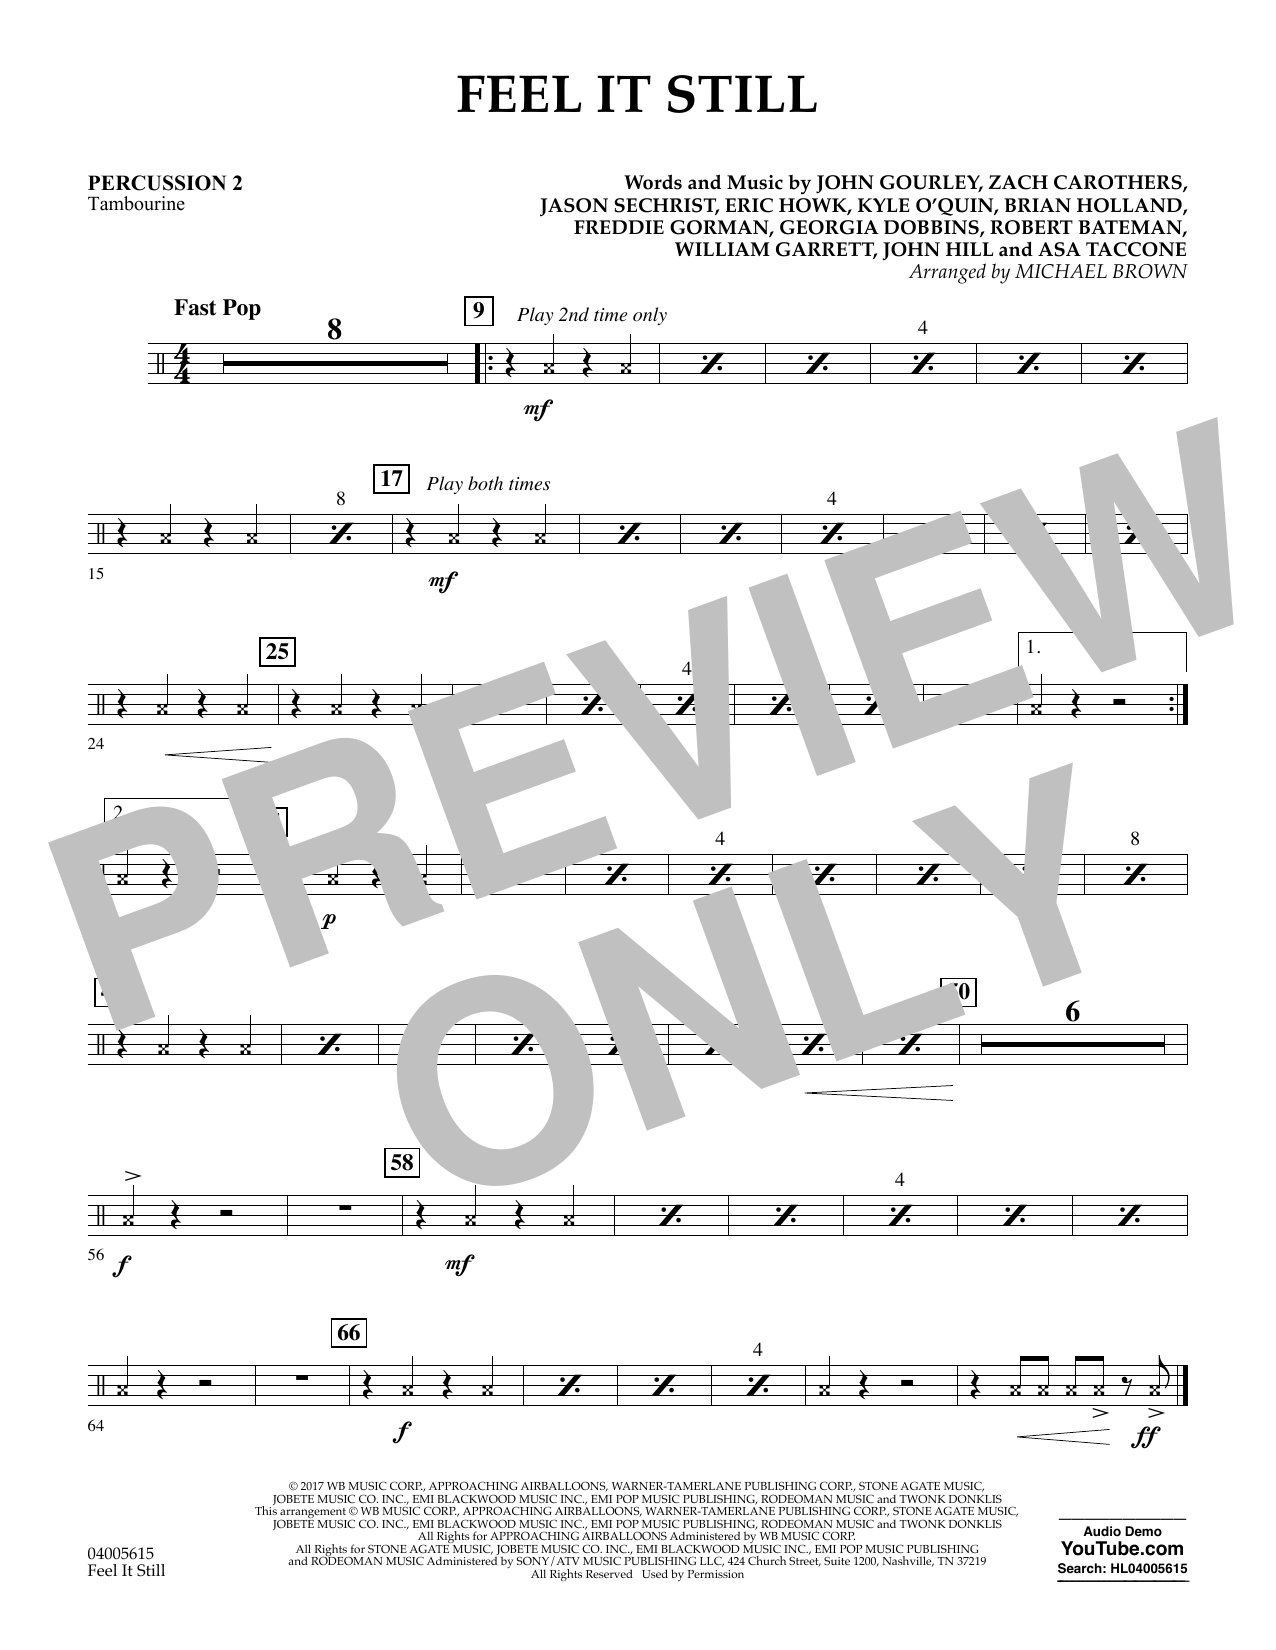 Feel It Still - Percussion 2 (Flex-Band)